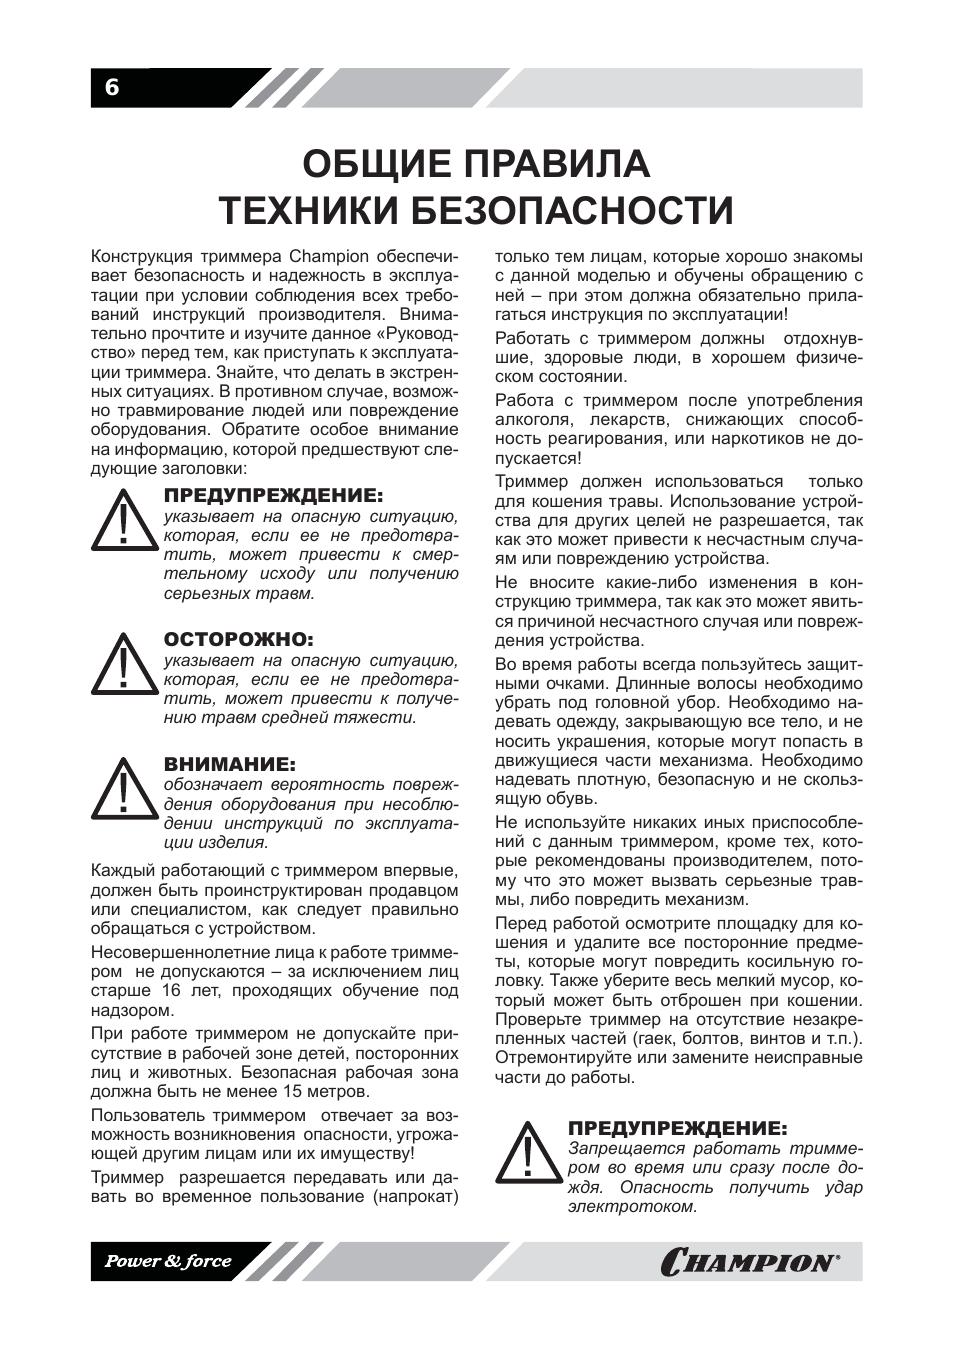 Общие правила техники безопасности